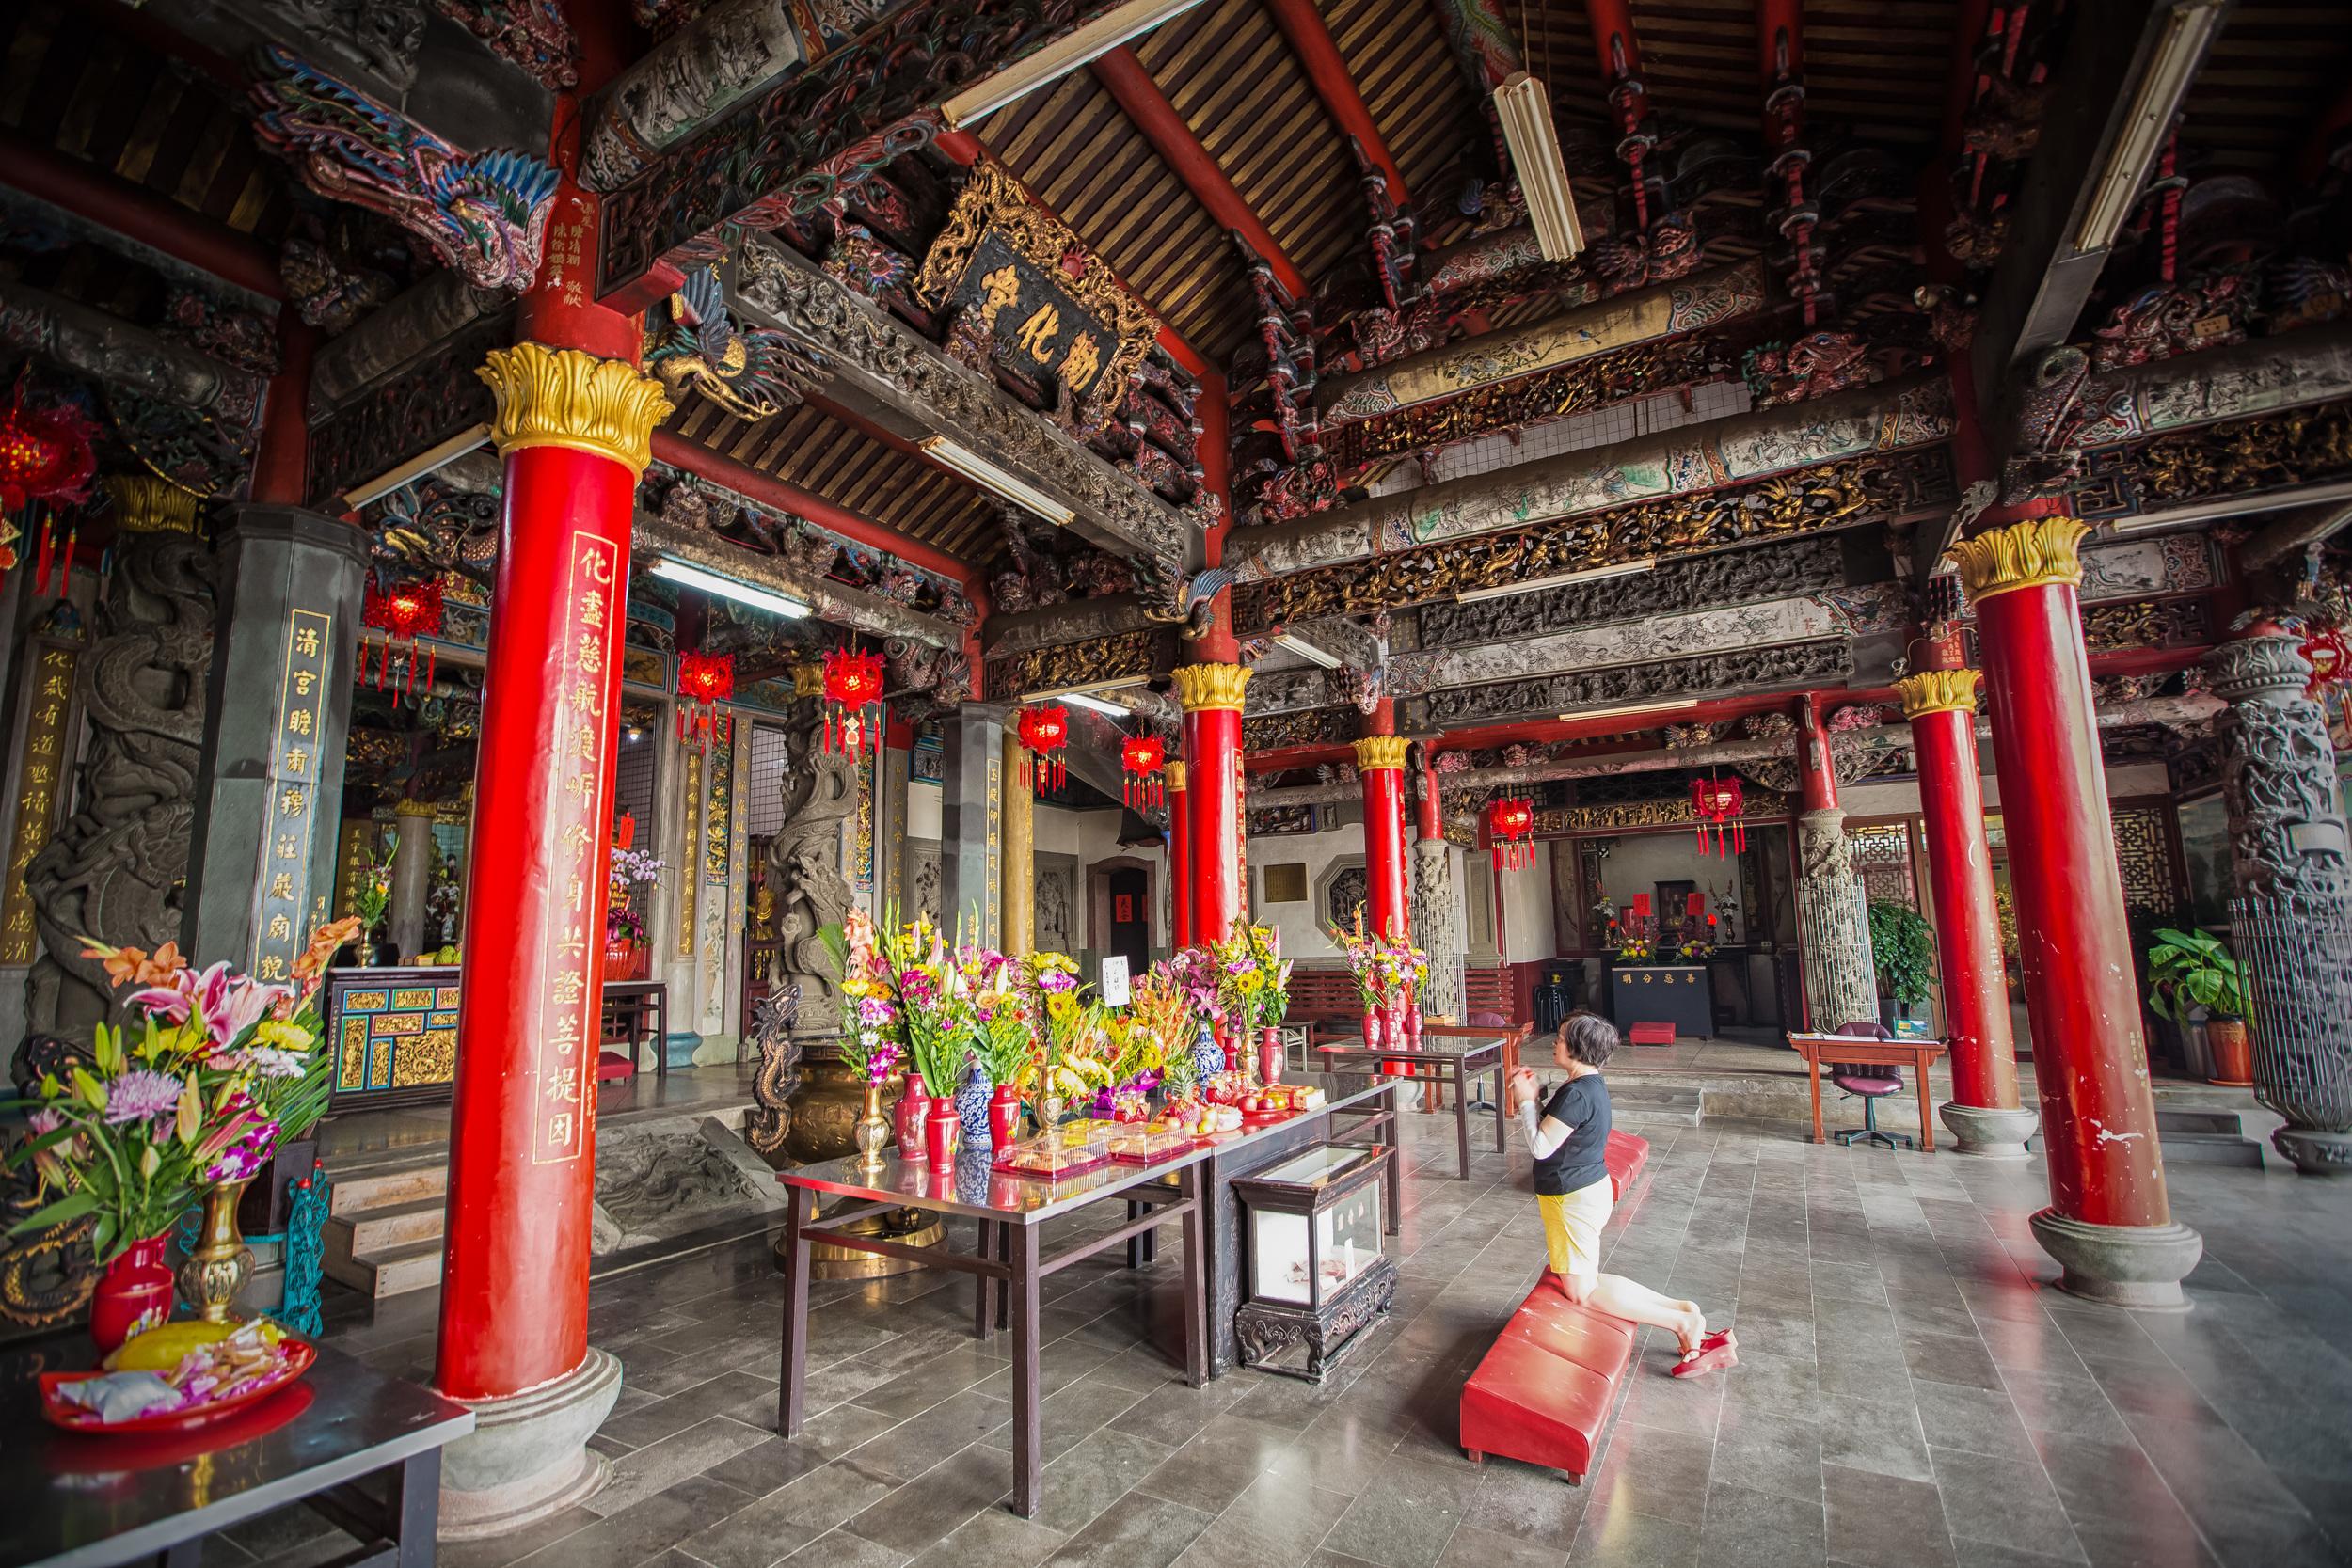 Praying at Quan-Hua Temple